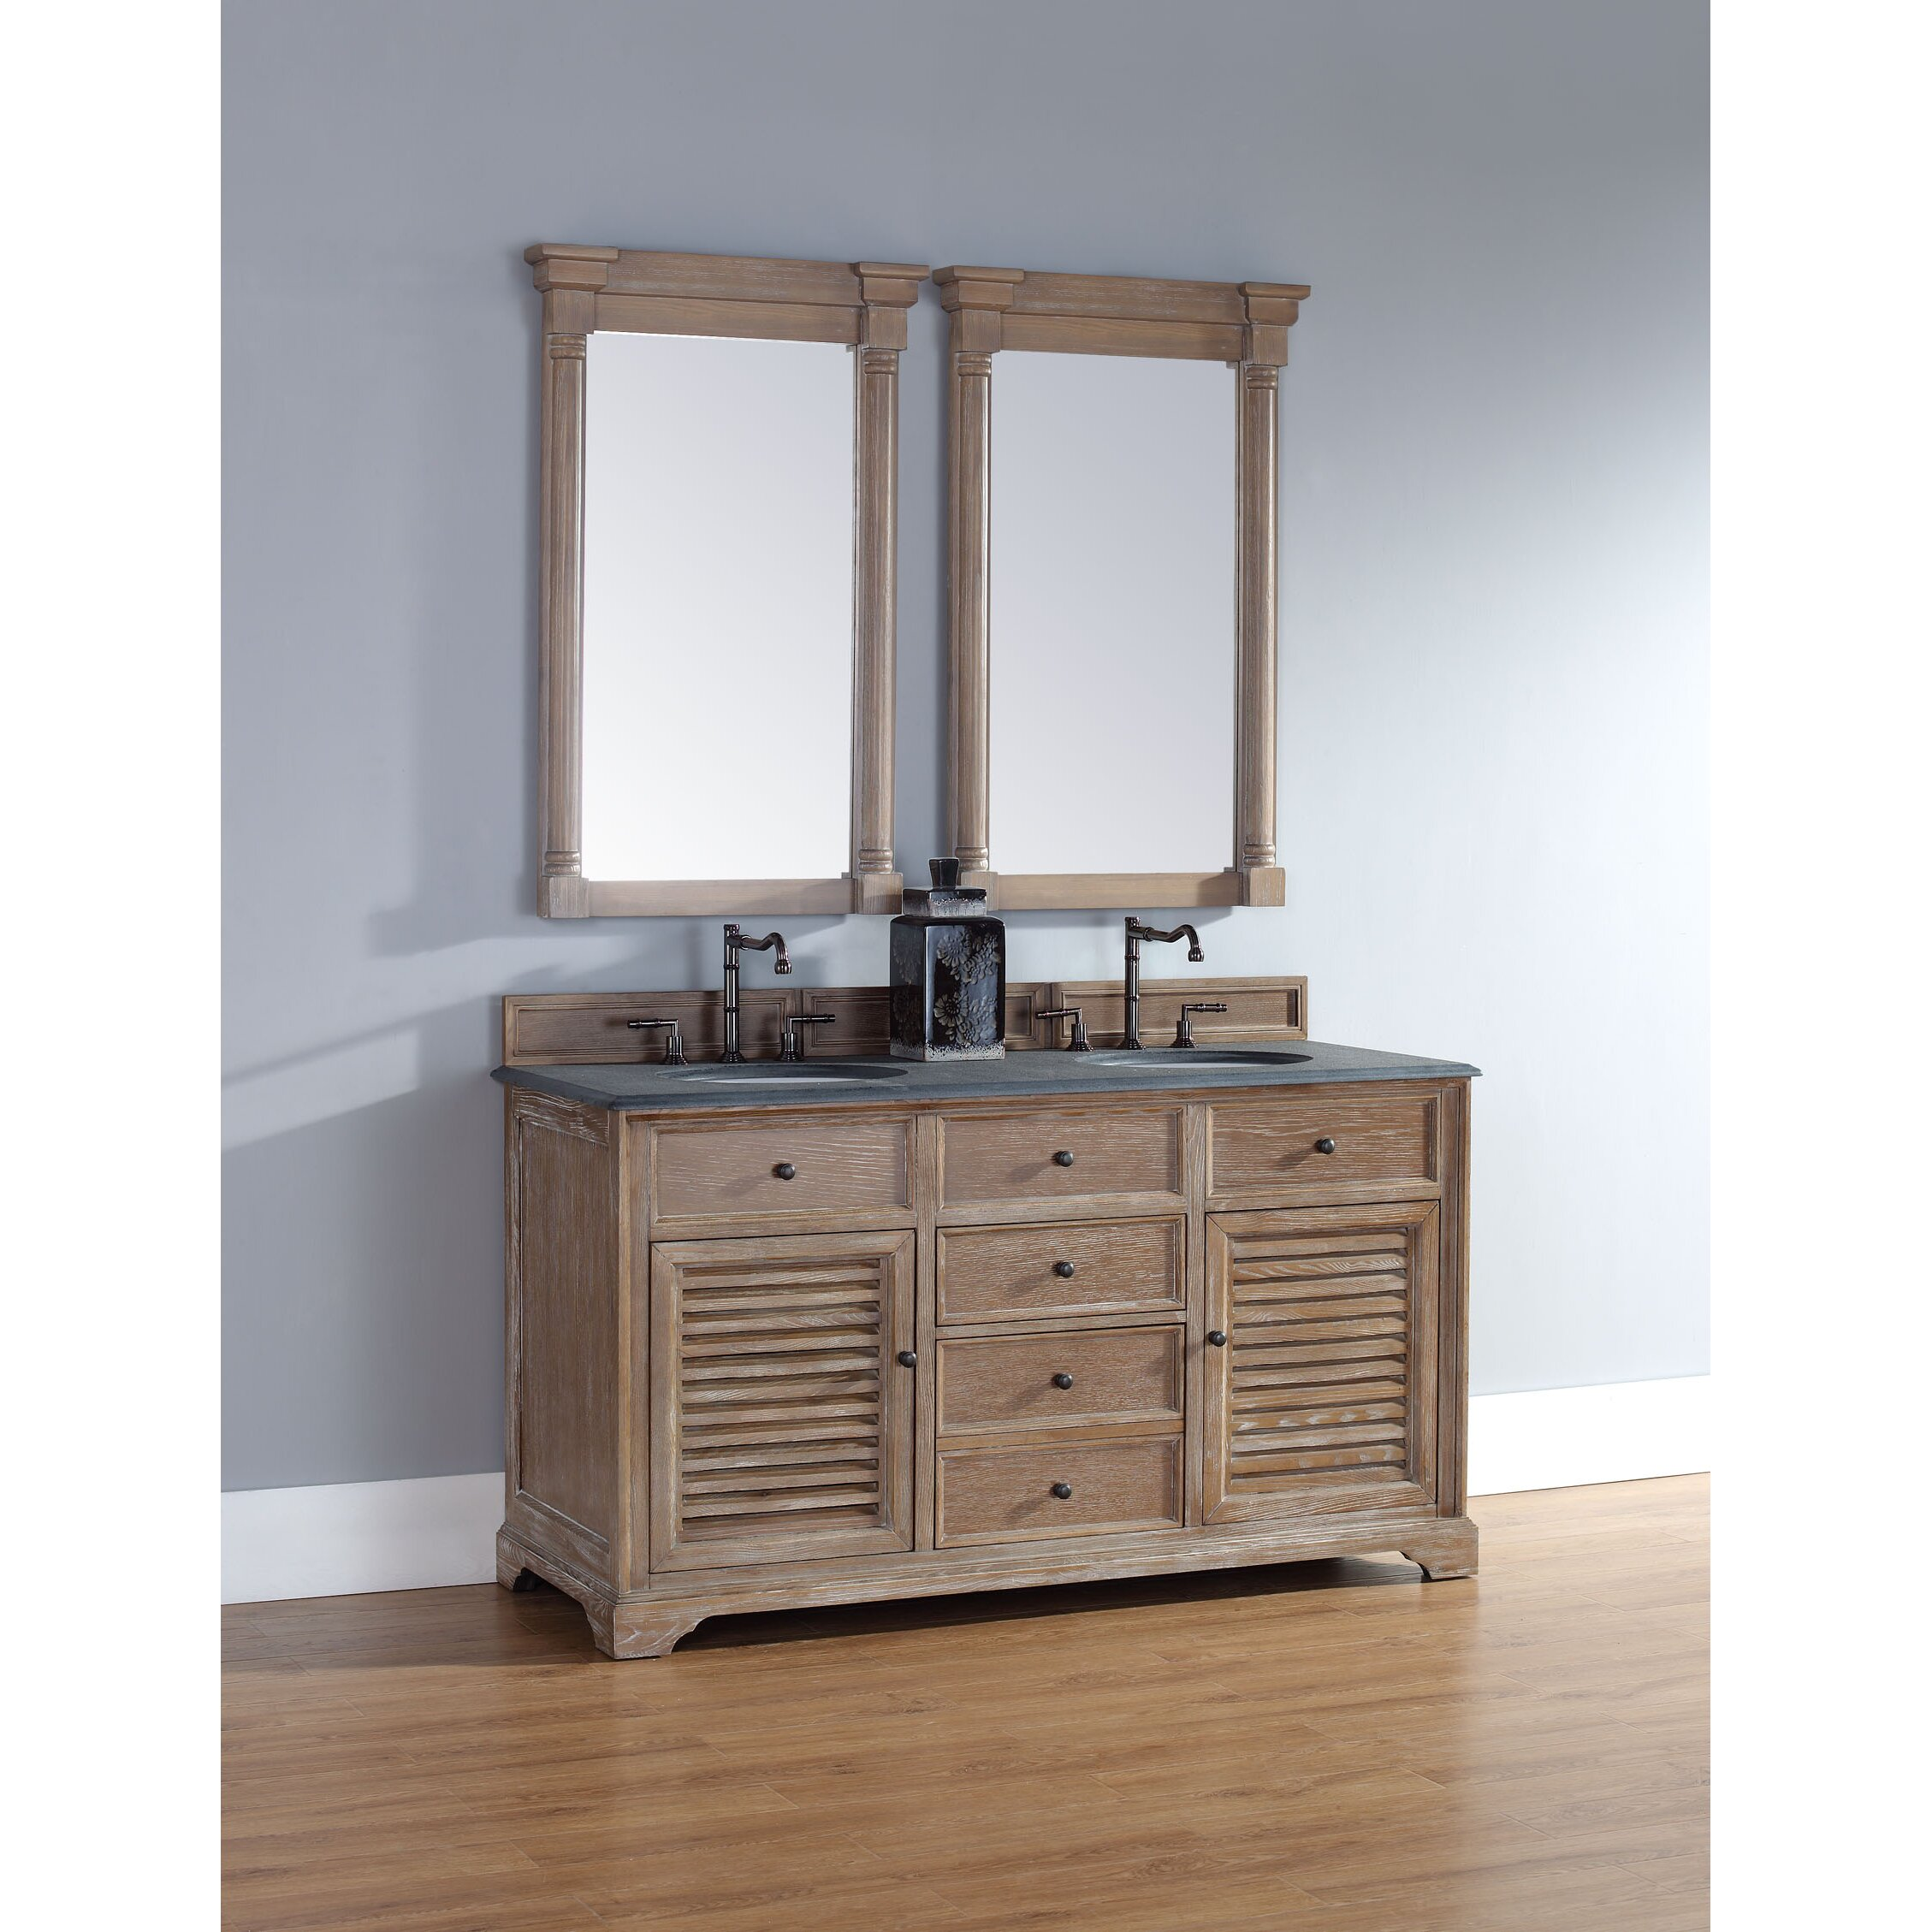 Driftwood Bathroom Mirror - James martin furniture savannah 60 quot double driftwood bathroom vanity set james martin furniture savannah